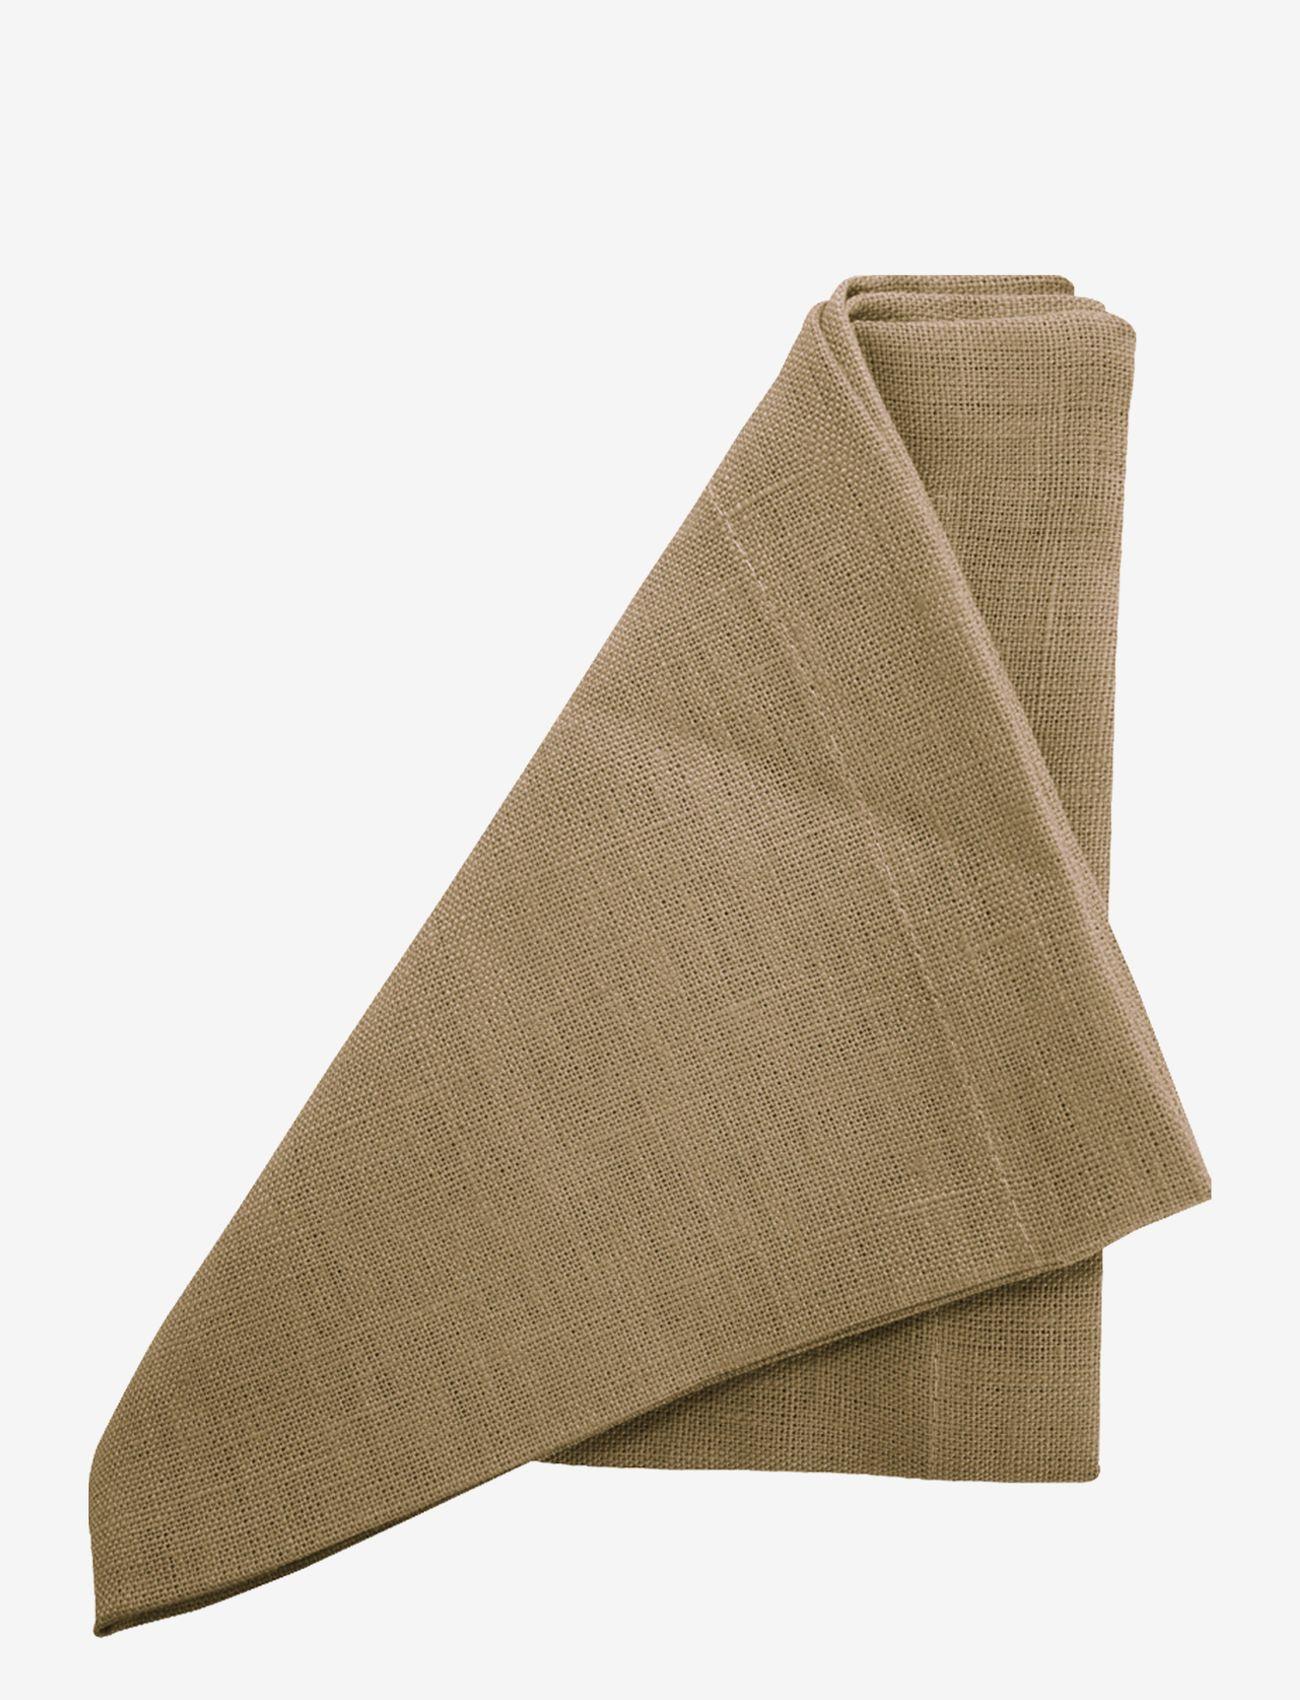 Au Maison - Napkin Linen Basic Washed (set of 4) - serveringsutstyr - desert - 0